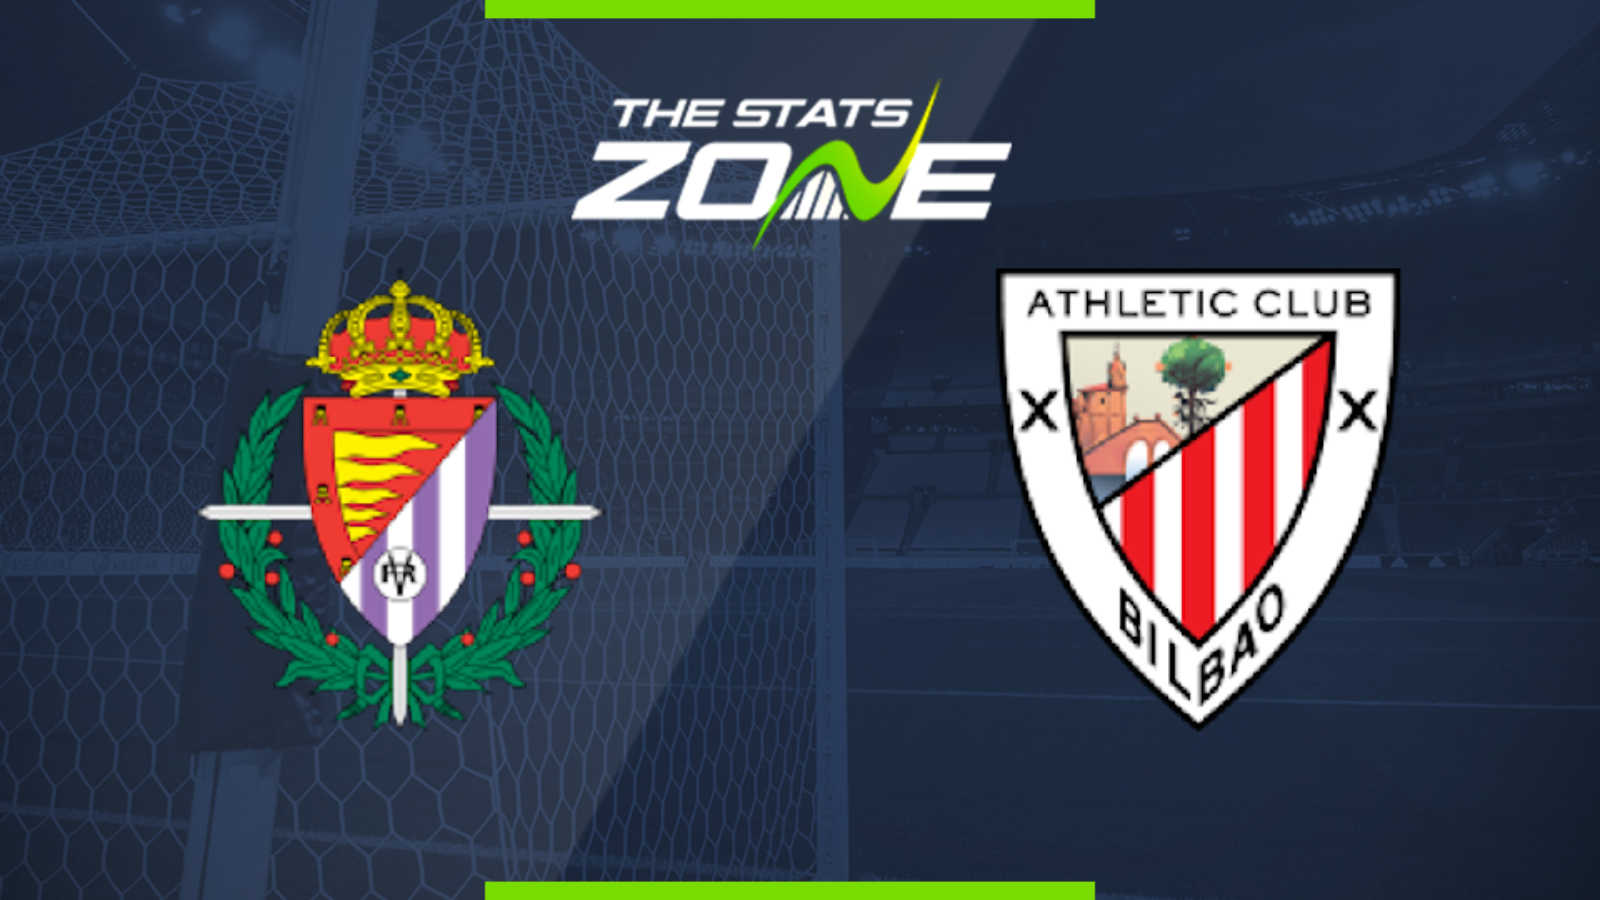 Valladolid vs cordoba betting expert basketball nhl game predictions today/betting